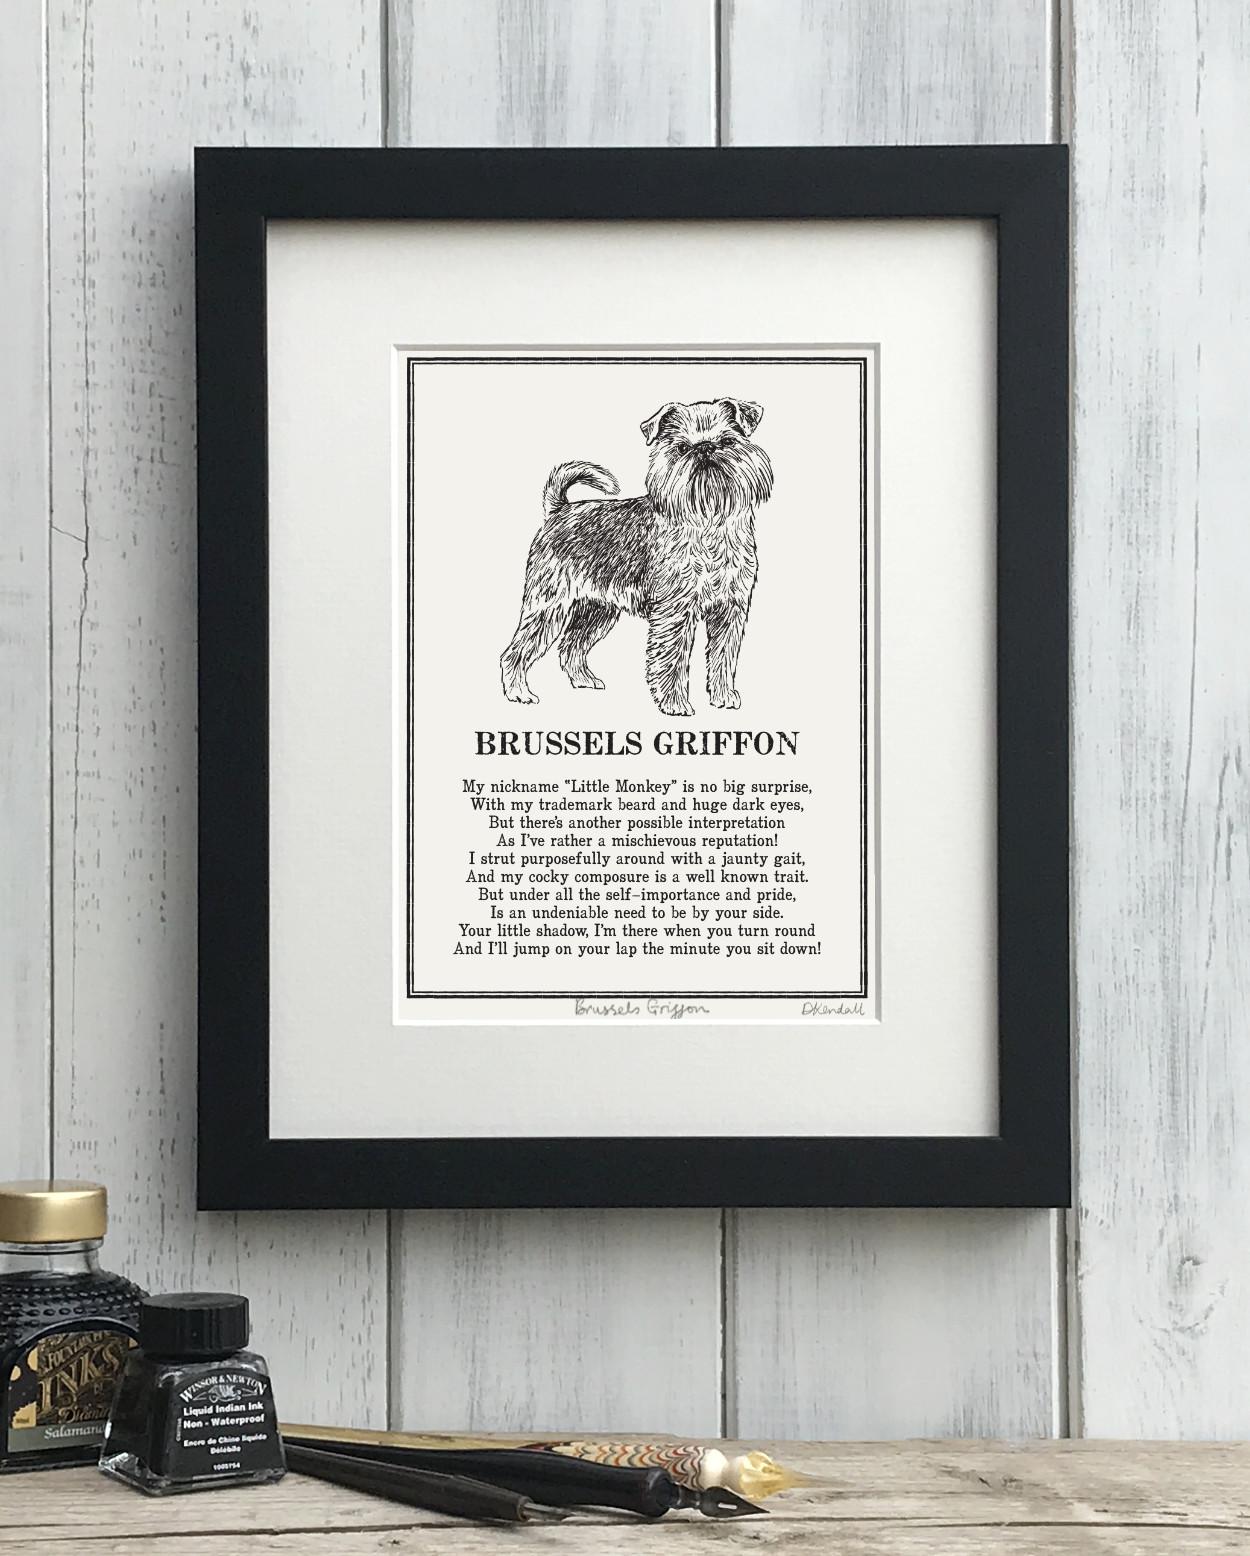 Brussels Griffon Doggerel Illustrated Poem Art Print | The Enlightened Hound